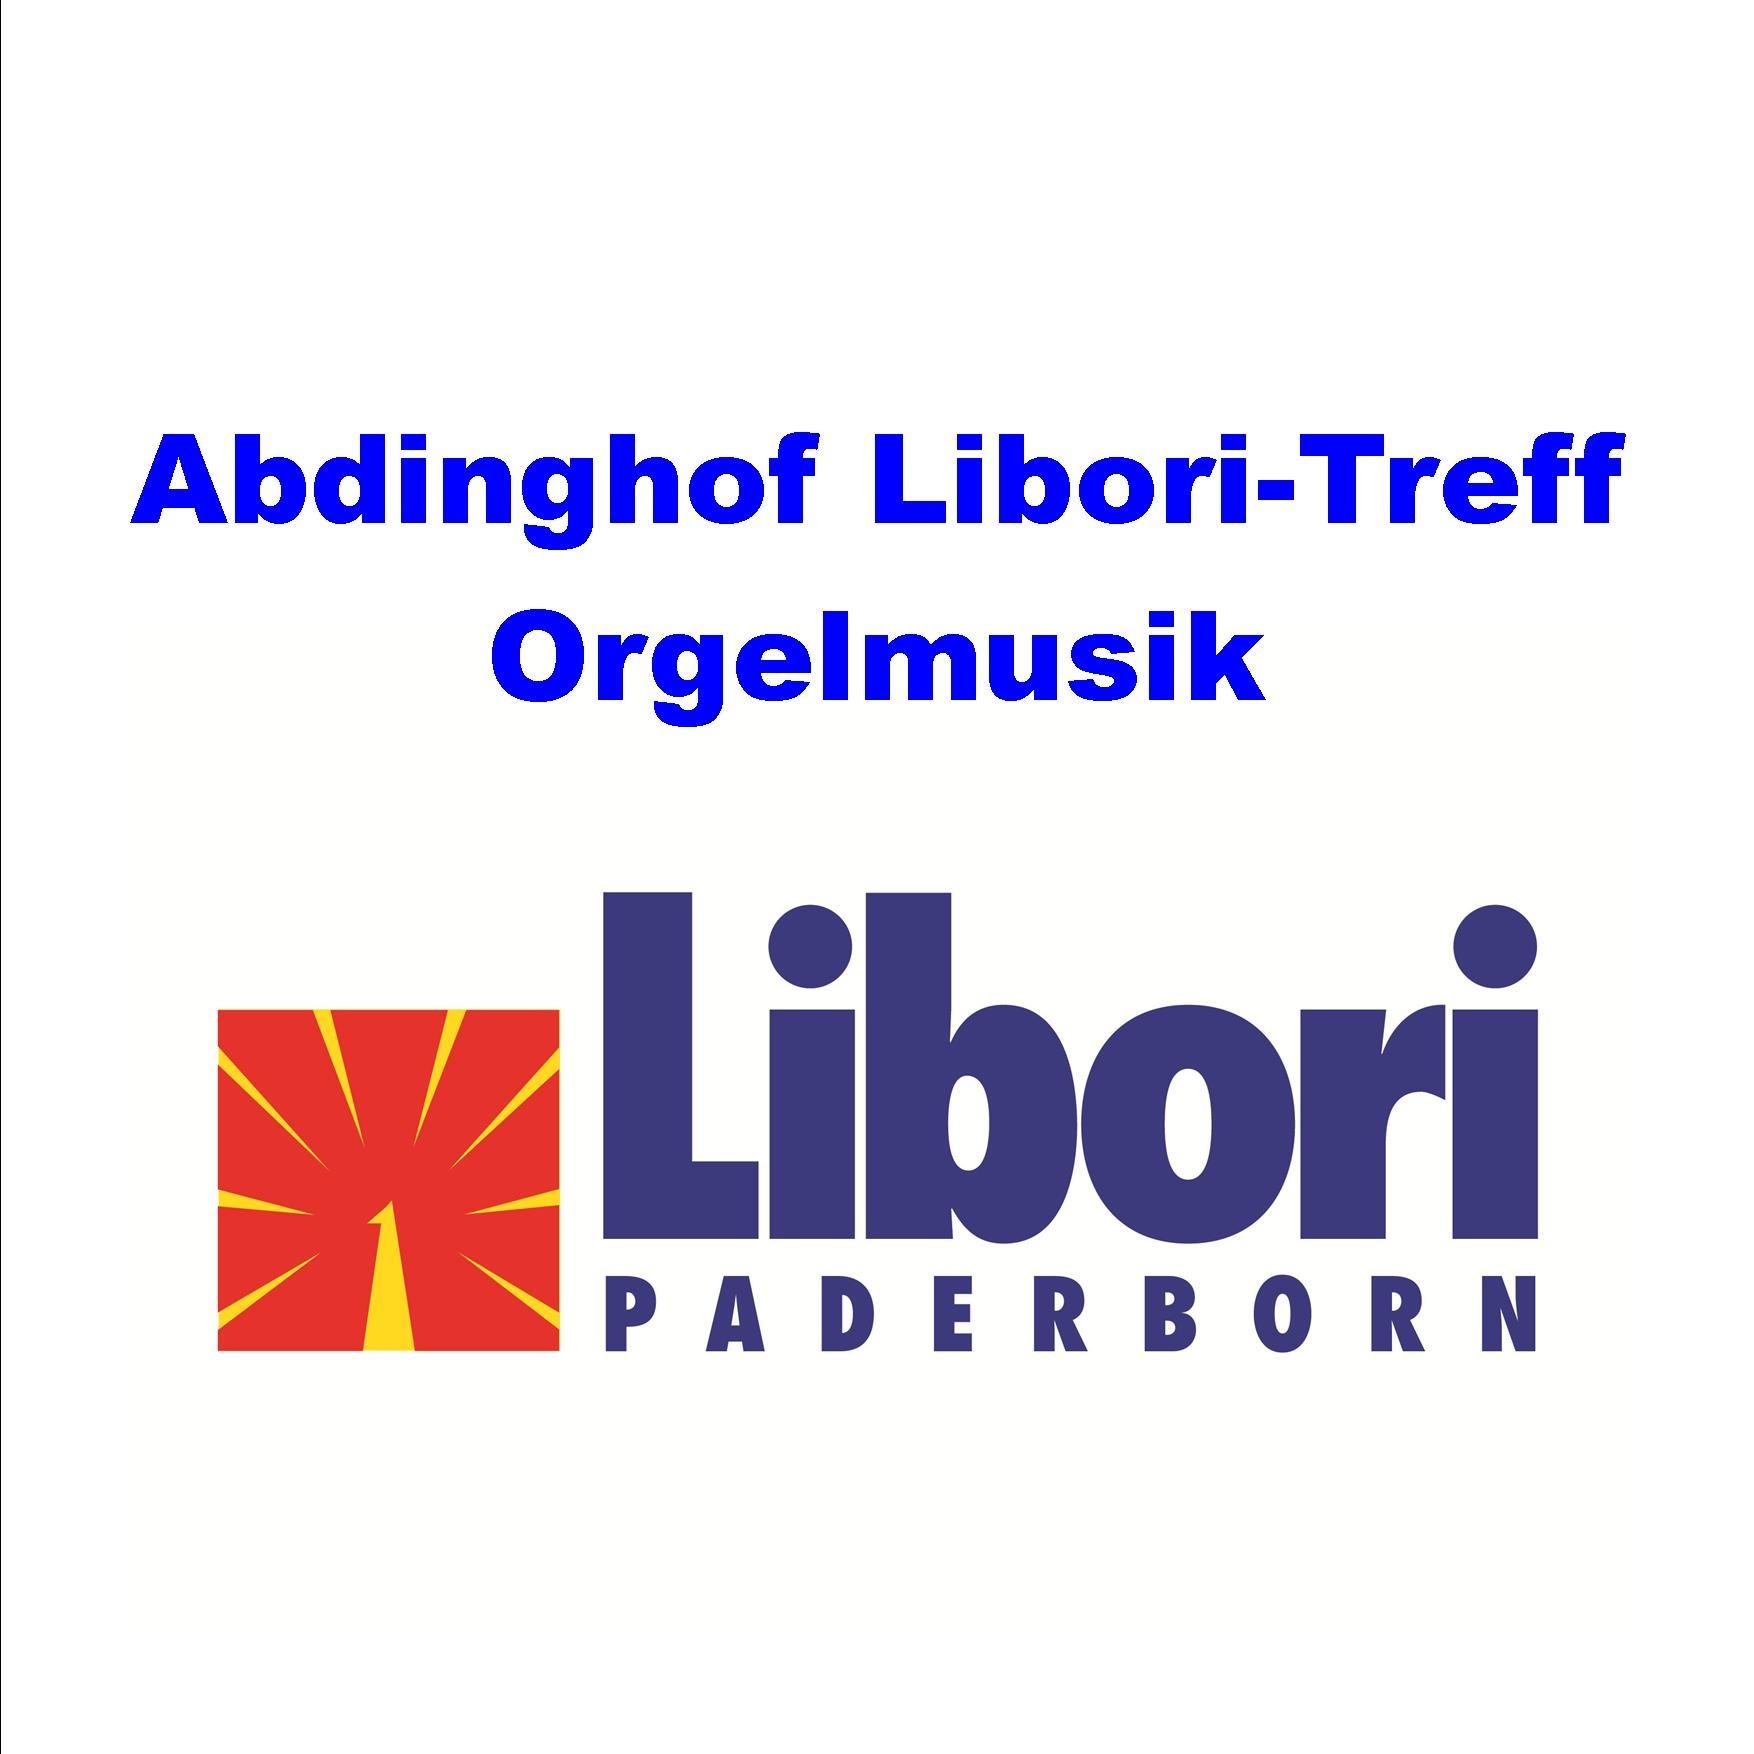 Abdinghof mit Libori-Treff und Orgelmusik Paderborn feiert Libori-Fest